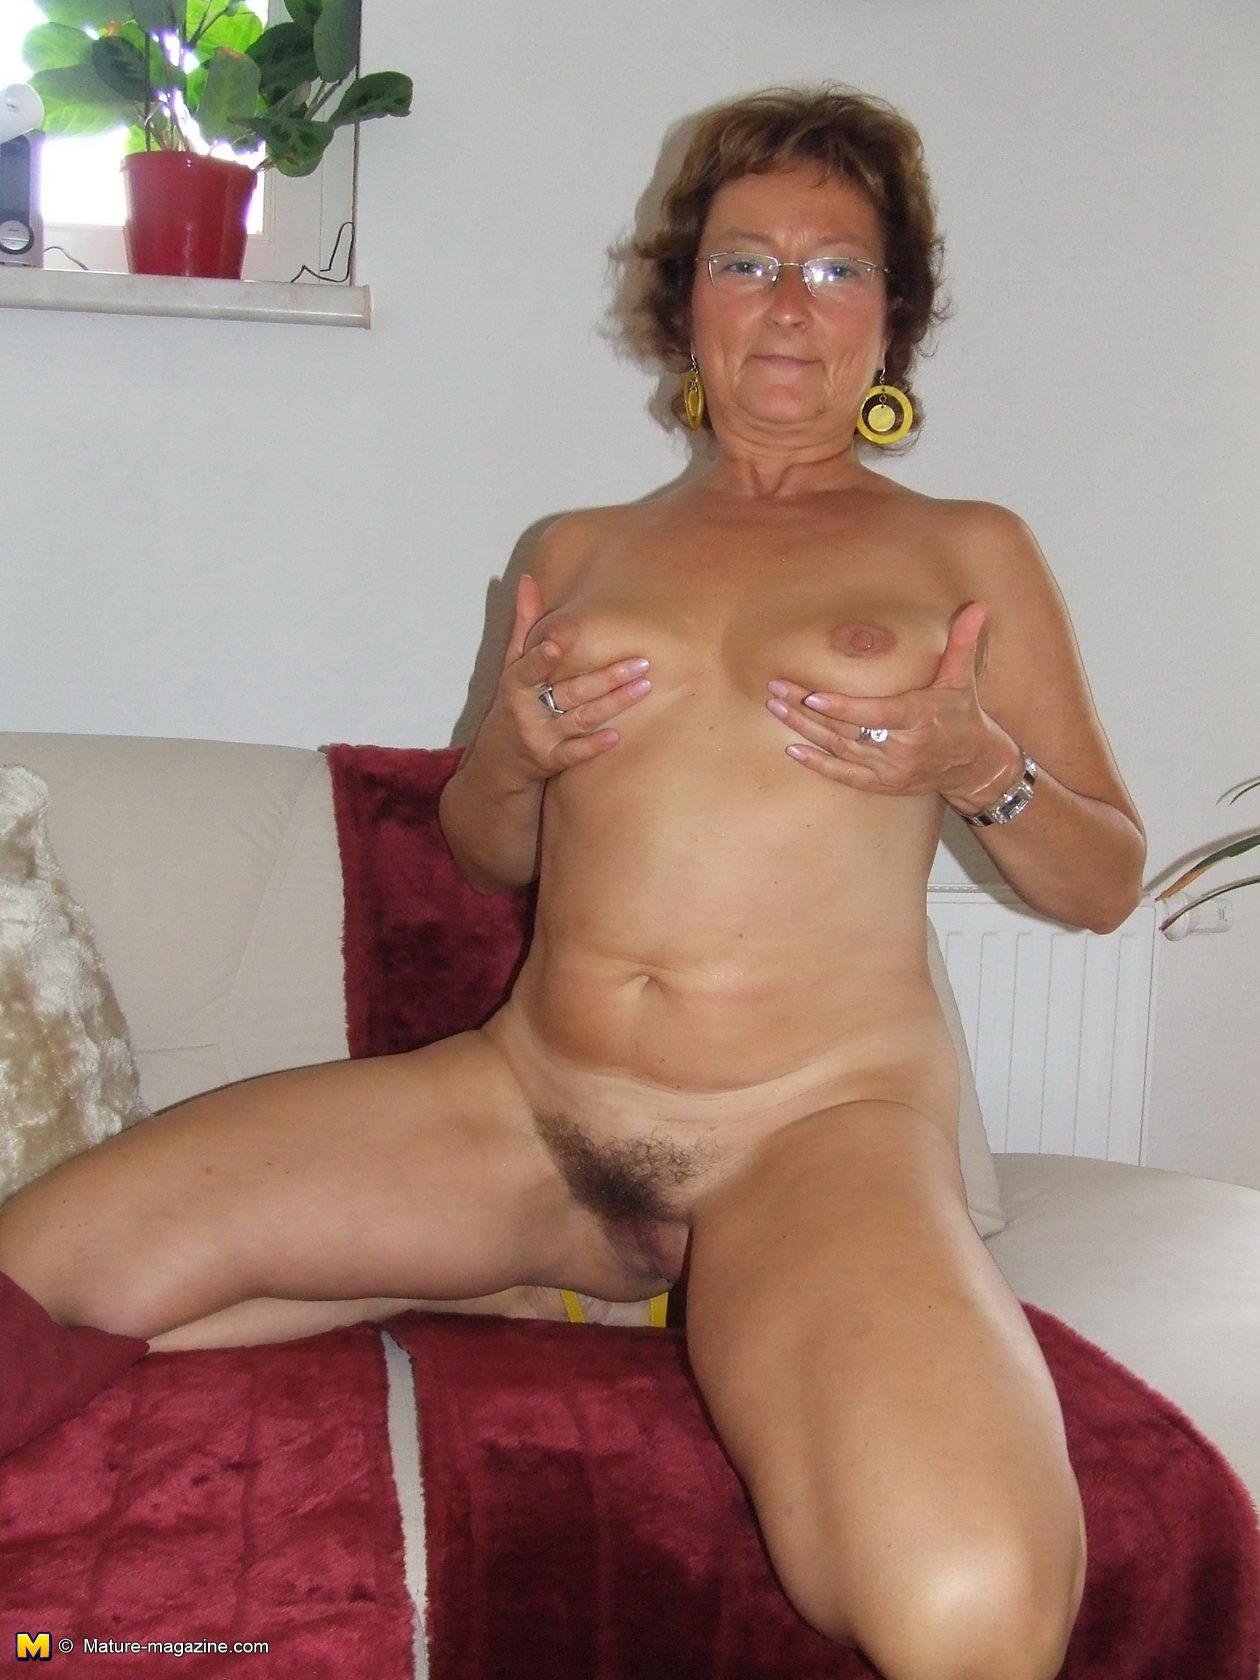 Big boob femdom videos